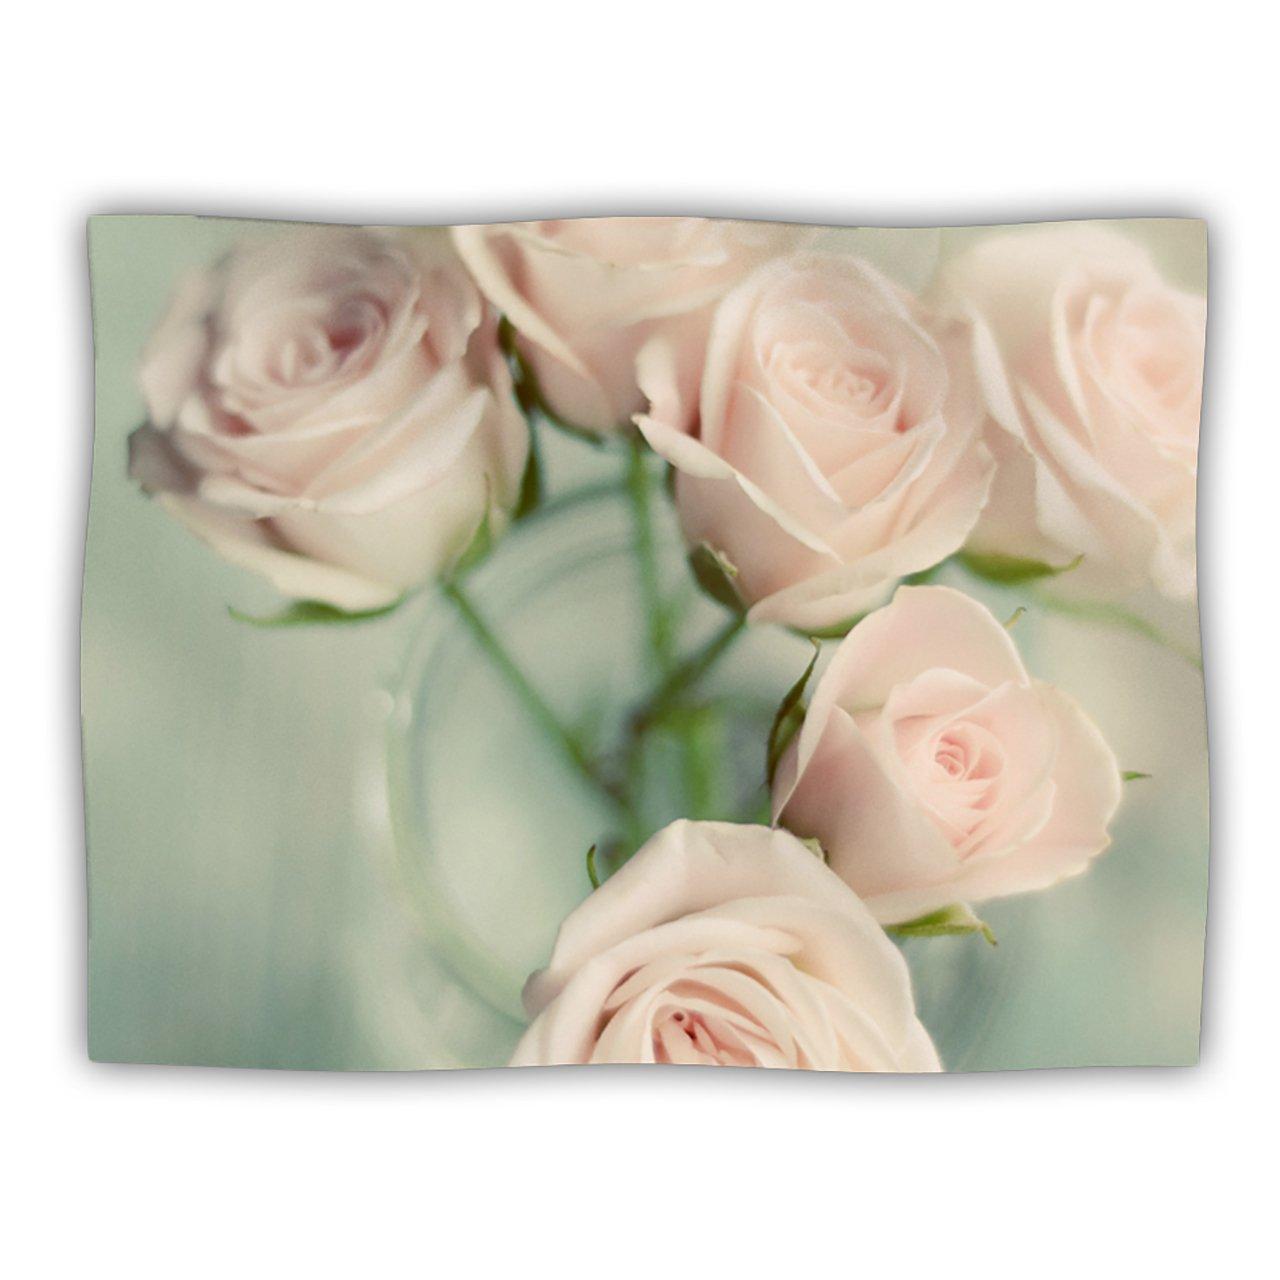 Kess InHouse Cristina Mitchell  Pink Romance  Teal bluesh Pet Blanket, 40 by 30-Inch